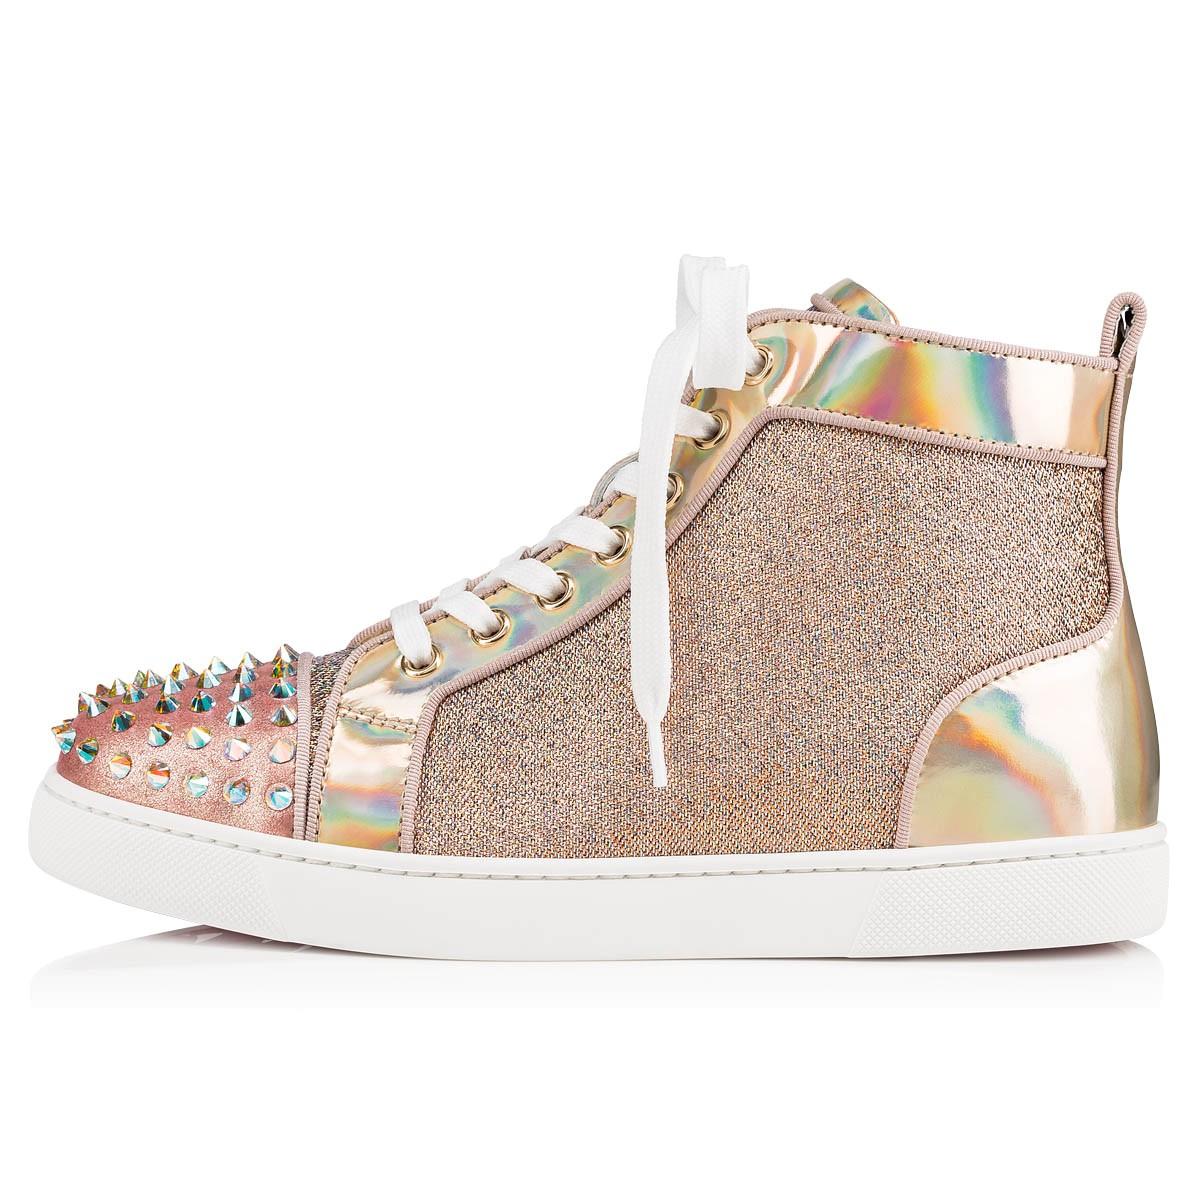 Shoes - Lou Spikes Krystal Donna Flat - Christian Louboutin